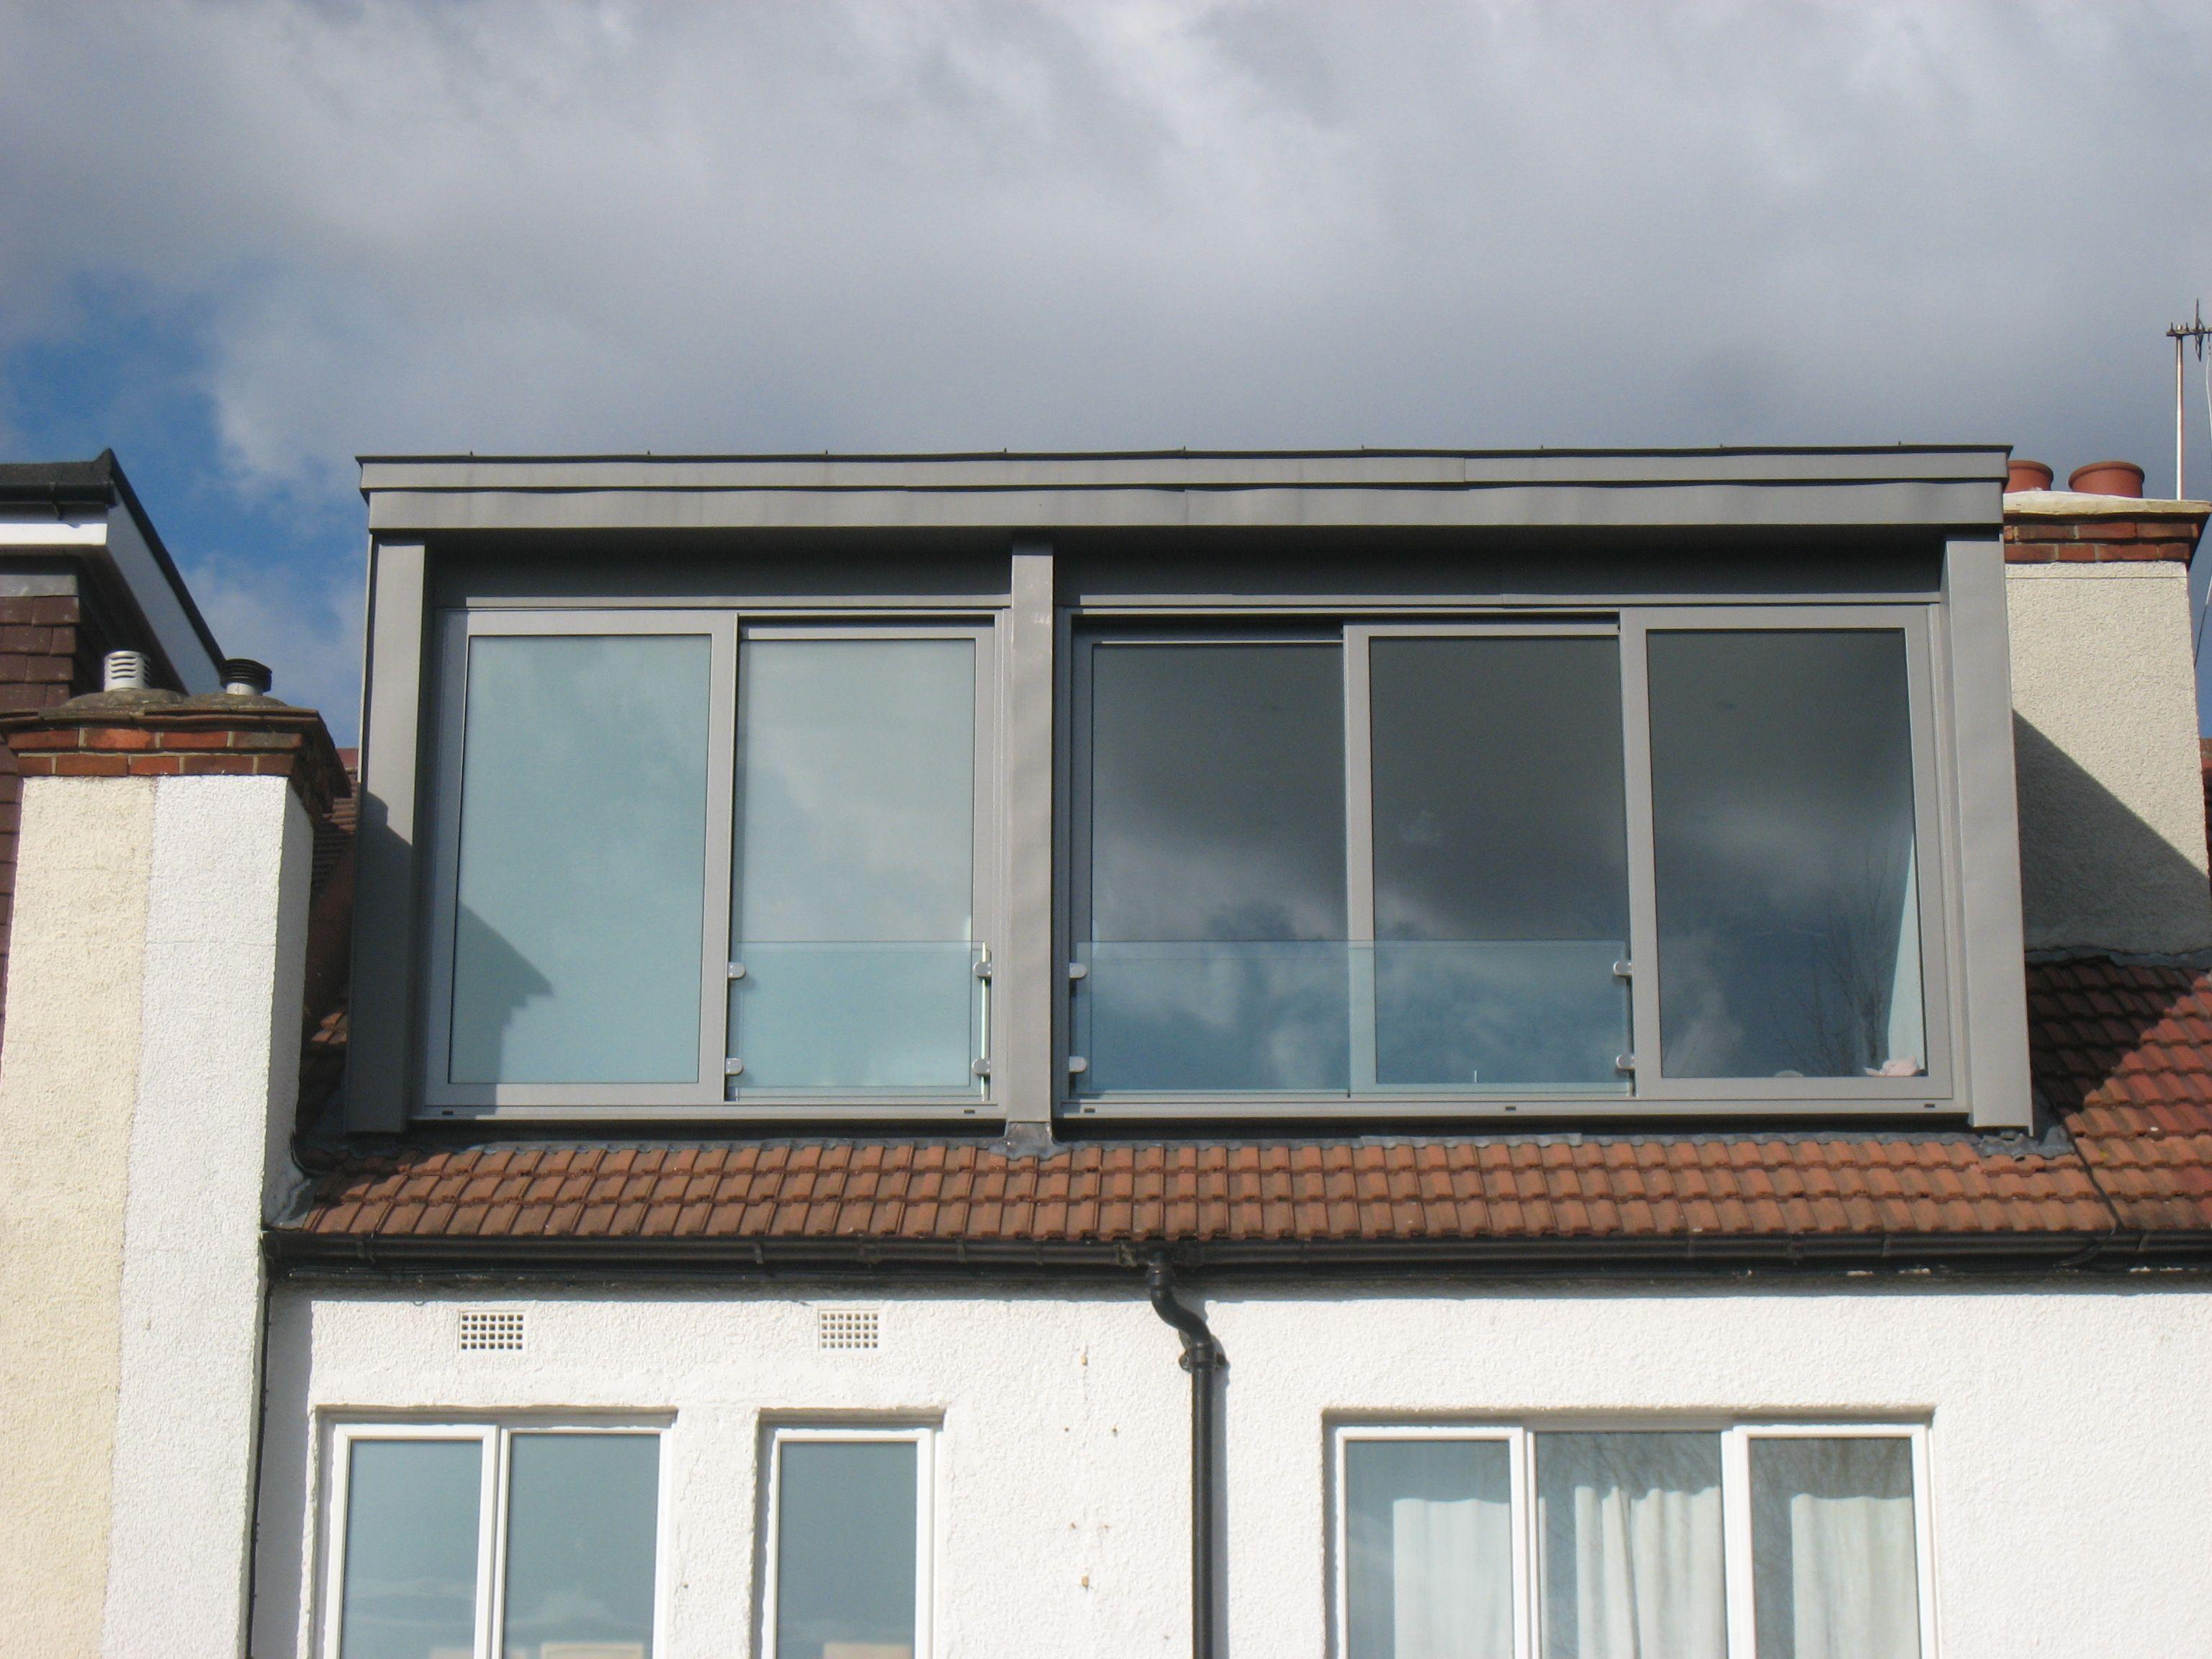 Our Zinc Clad Loft With Sliding Aluminium Framed Windows Great Views Out Over South London Lots Loft Dormer House Extension Design Dormer Loft Conversion